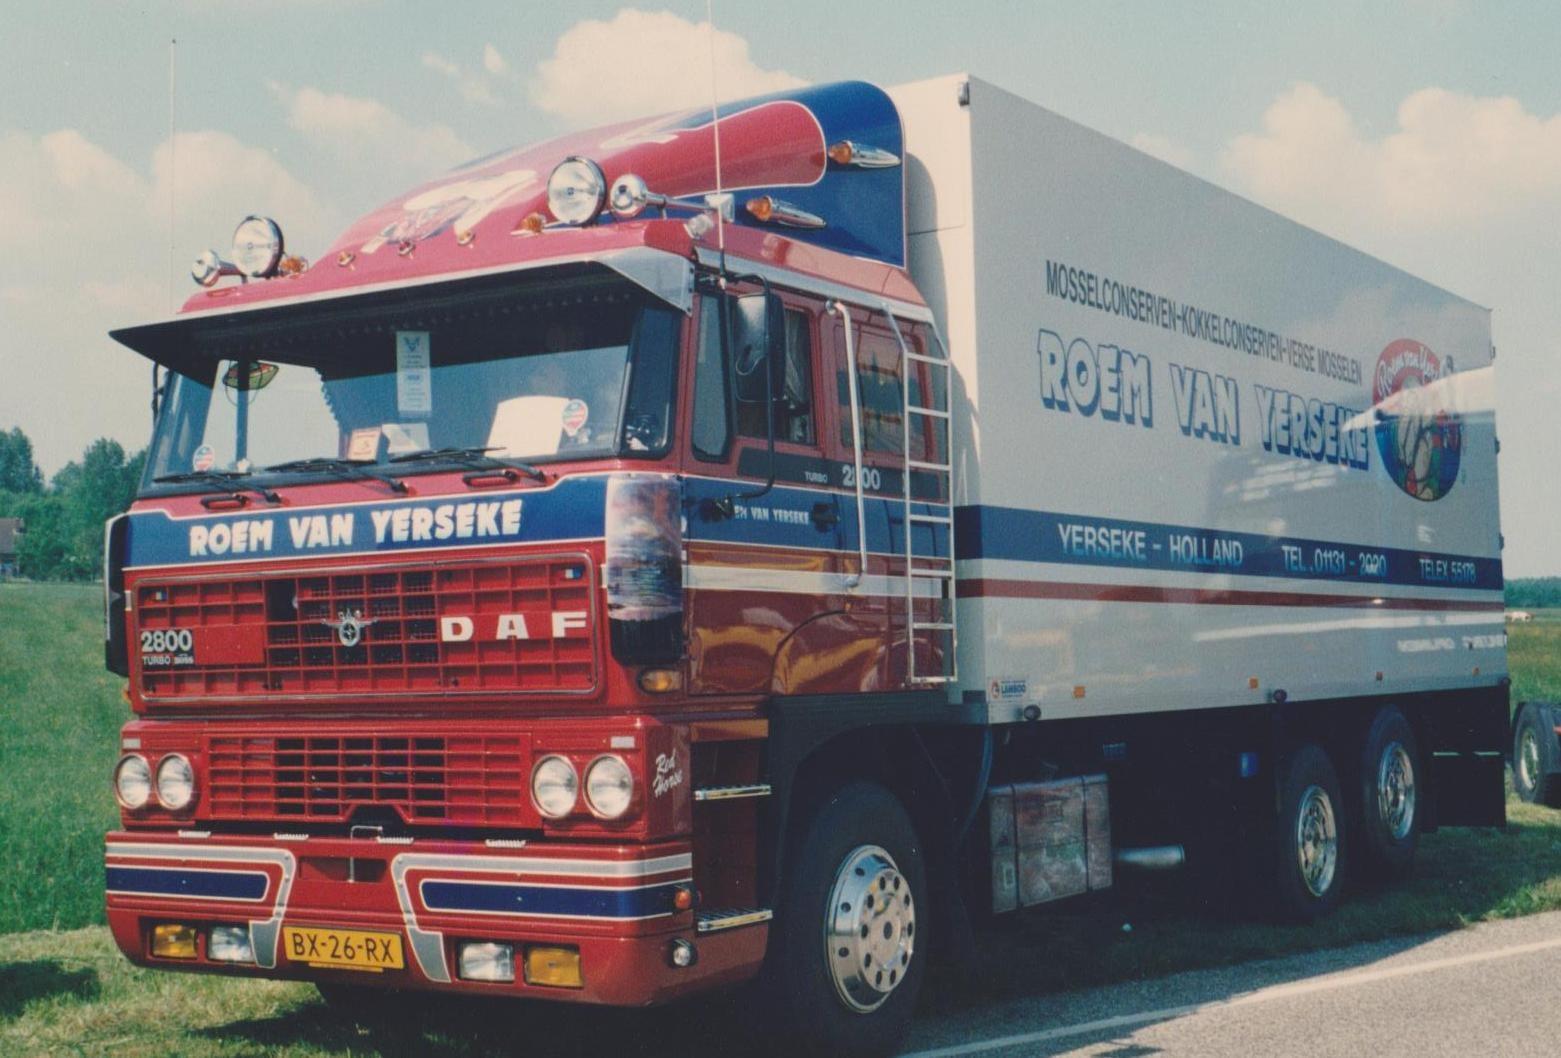 Daf-2800-Wim-Zijderveld-foto-(1)